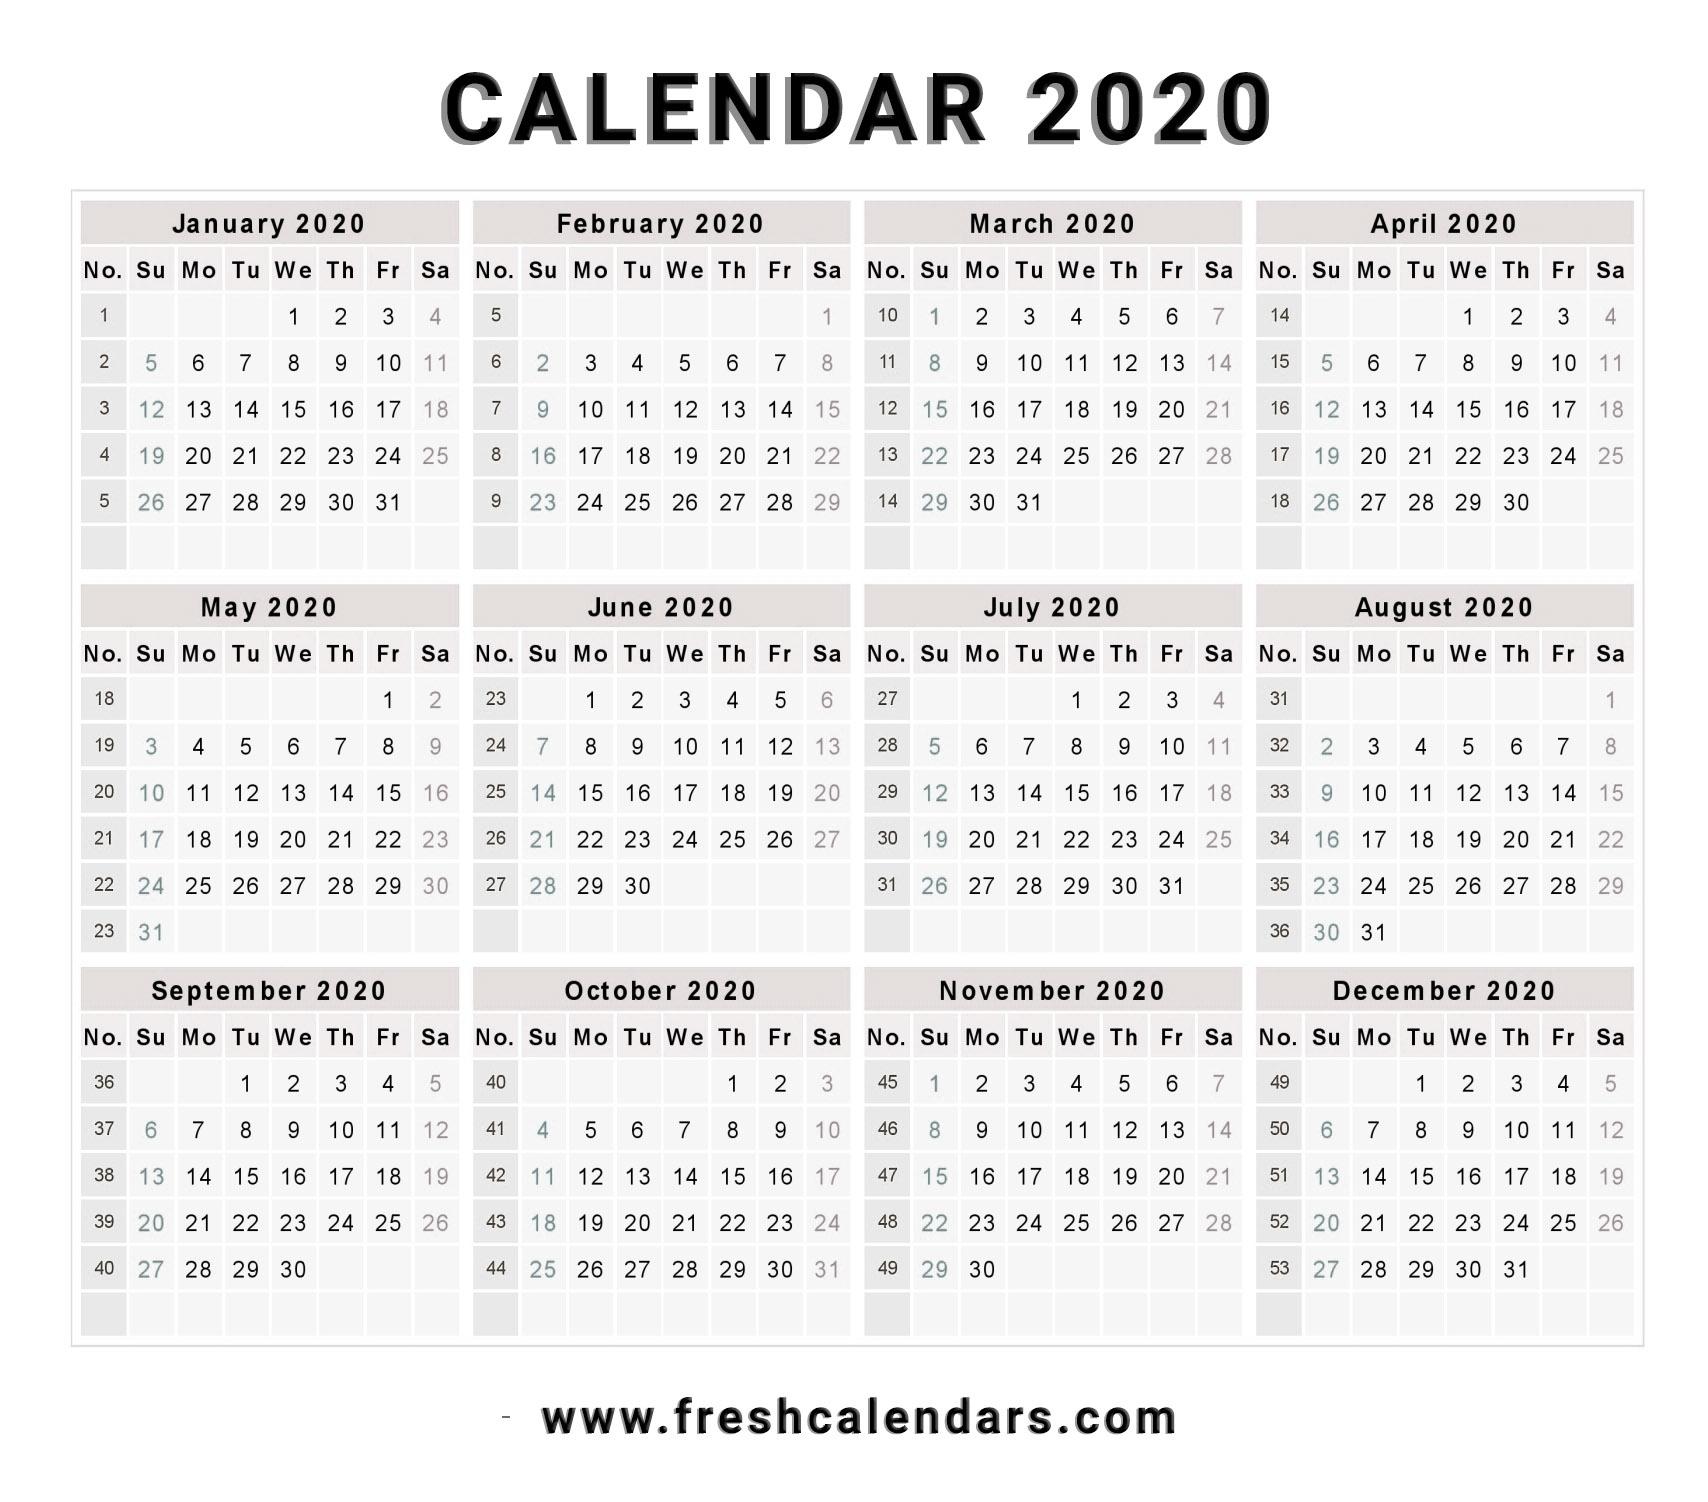 2020 Calendar Remarkable 2020 Calendar Free Download